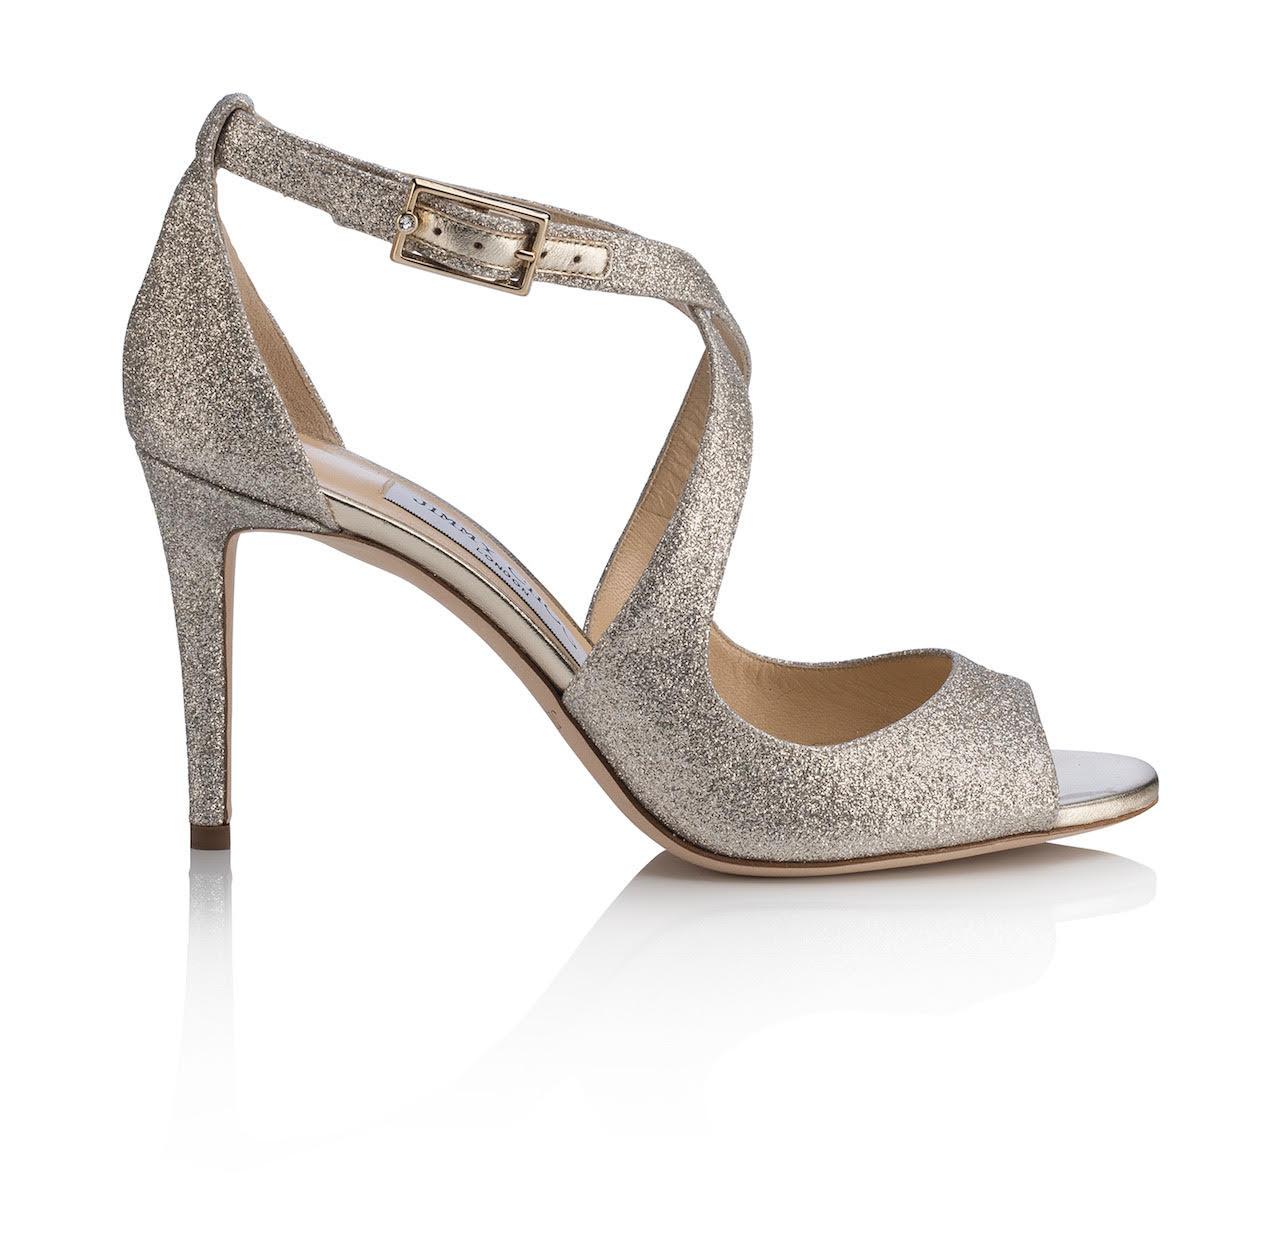 0b71b4b9d4 Costbuys Women Pumps Heels Sexy High Heels Shoes Women Wedding Shoes Pumps  Ladies Shoes Gold Silver